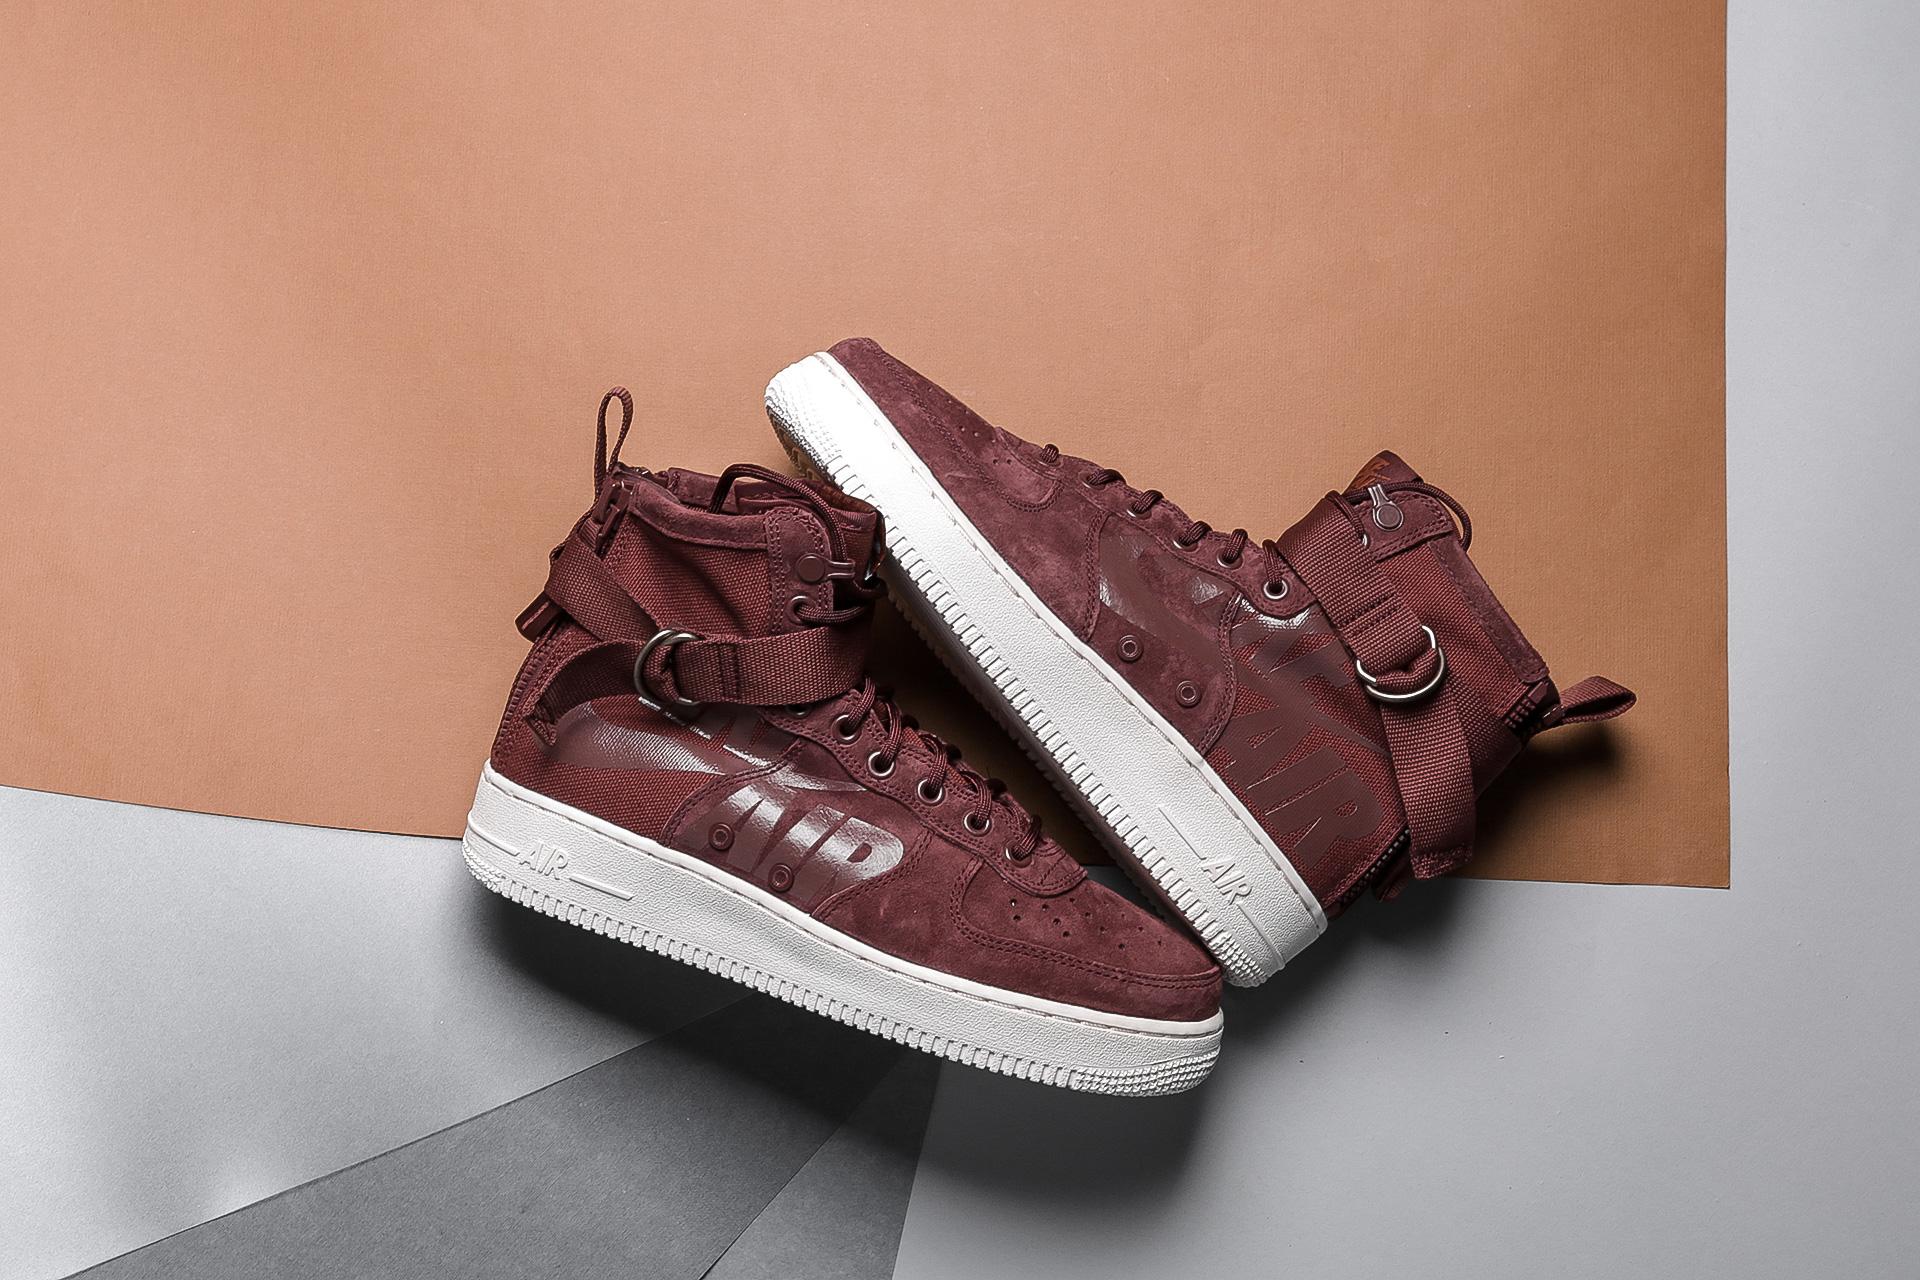 fe6c42e01722 Купить коричневые мужские кроссовки SF Air Force 1 Mid от Nike ...